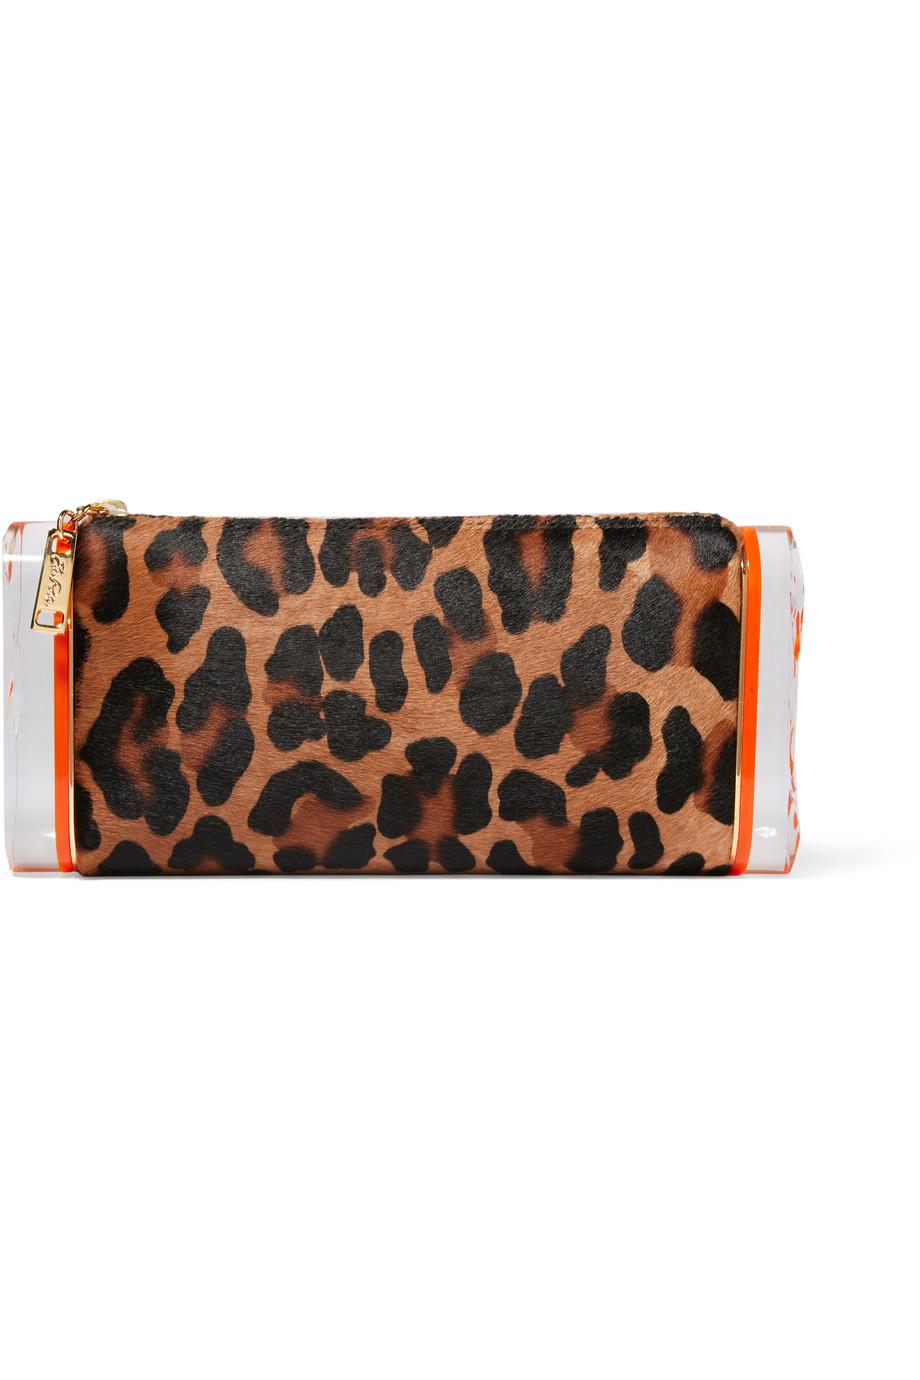 Edie Parker Lara Leopard-Print Calf Hair Acrylic Box Clutch, Leopard Print, Women's